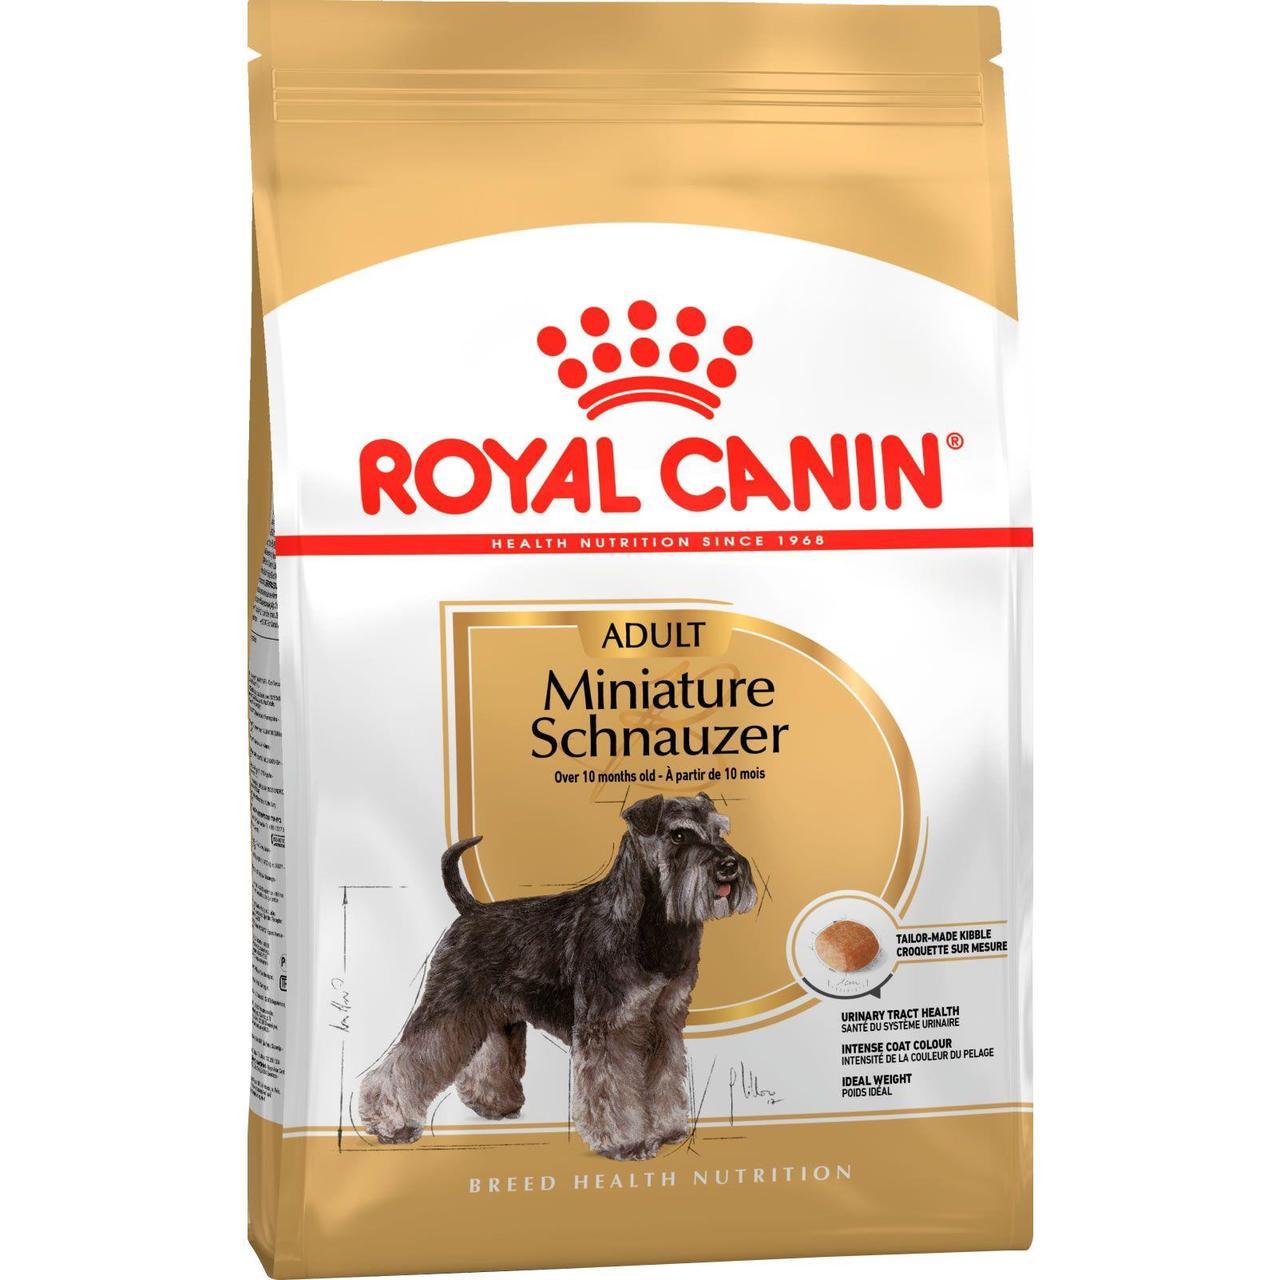 Корм для шнауцеров Royal Canin Miniature Schnauzer, 500 г, роял канин